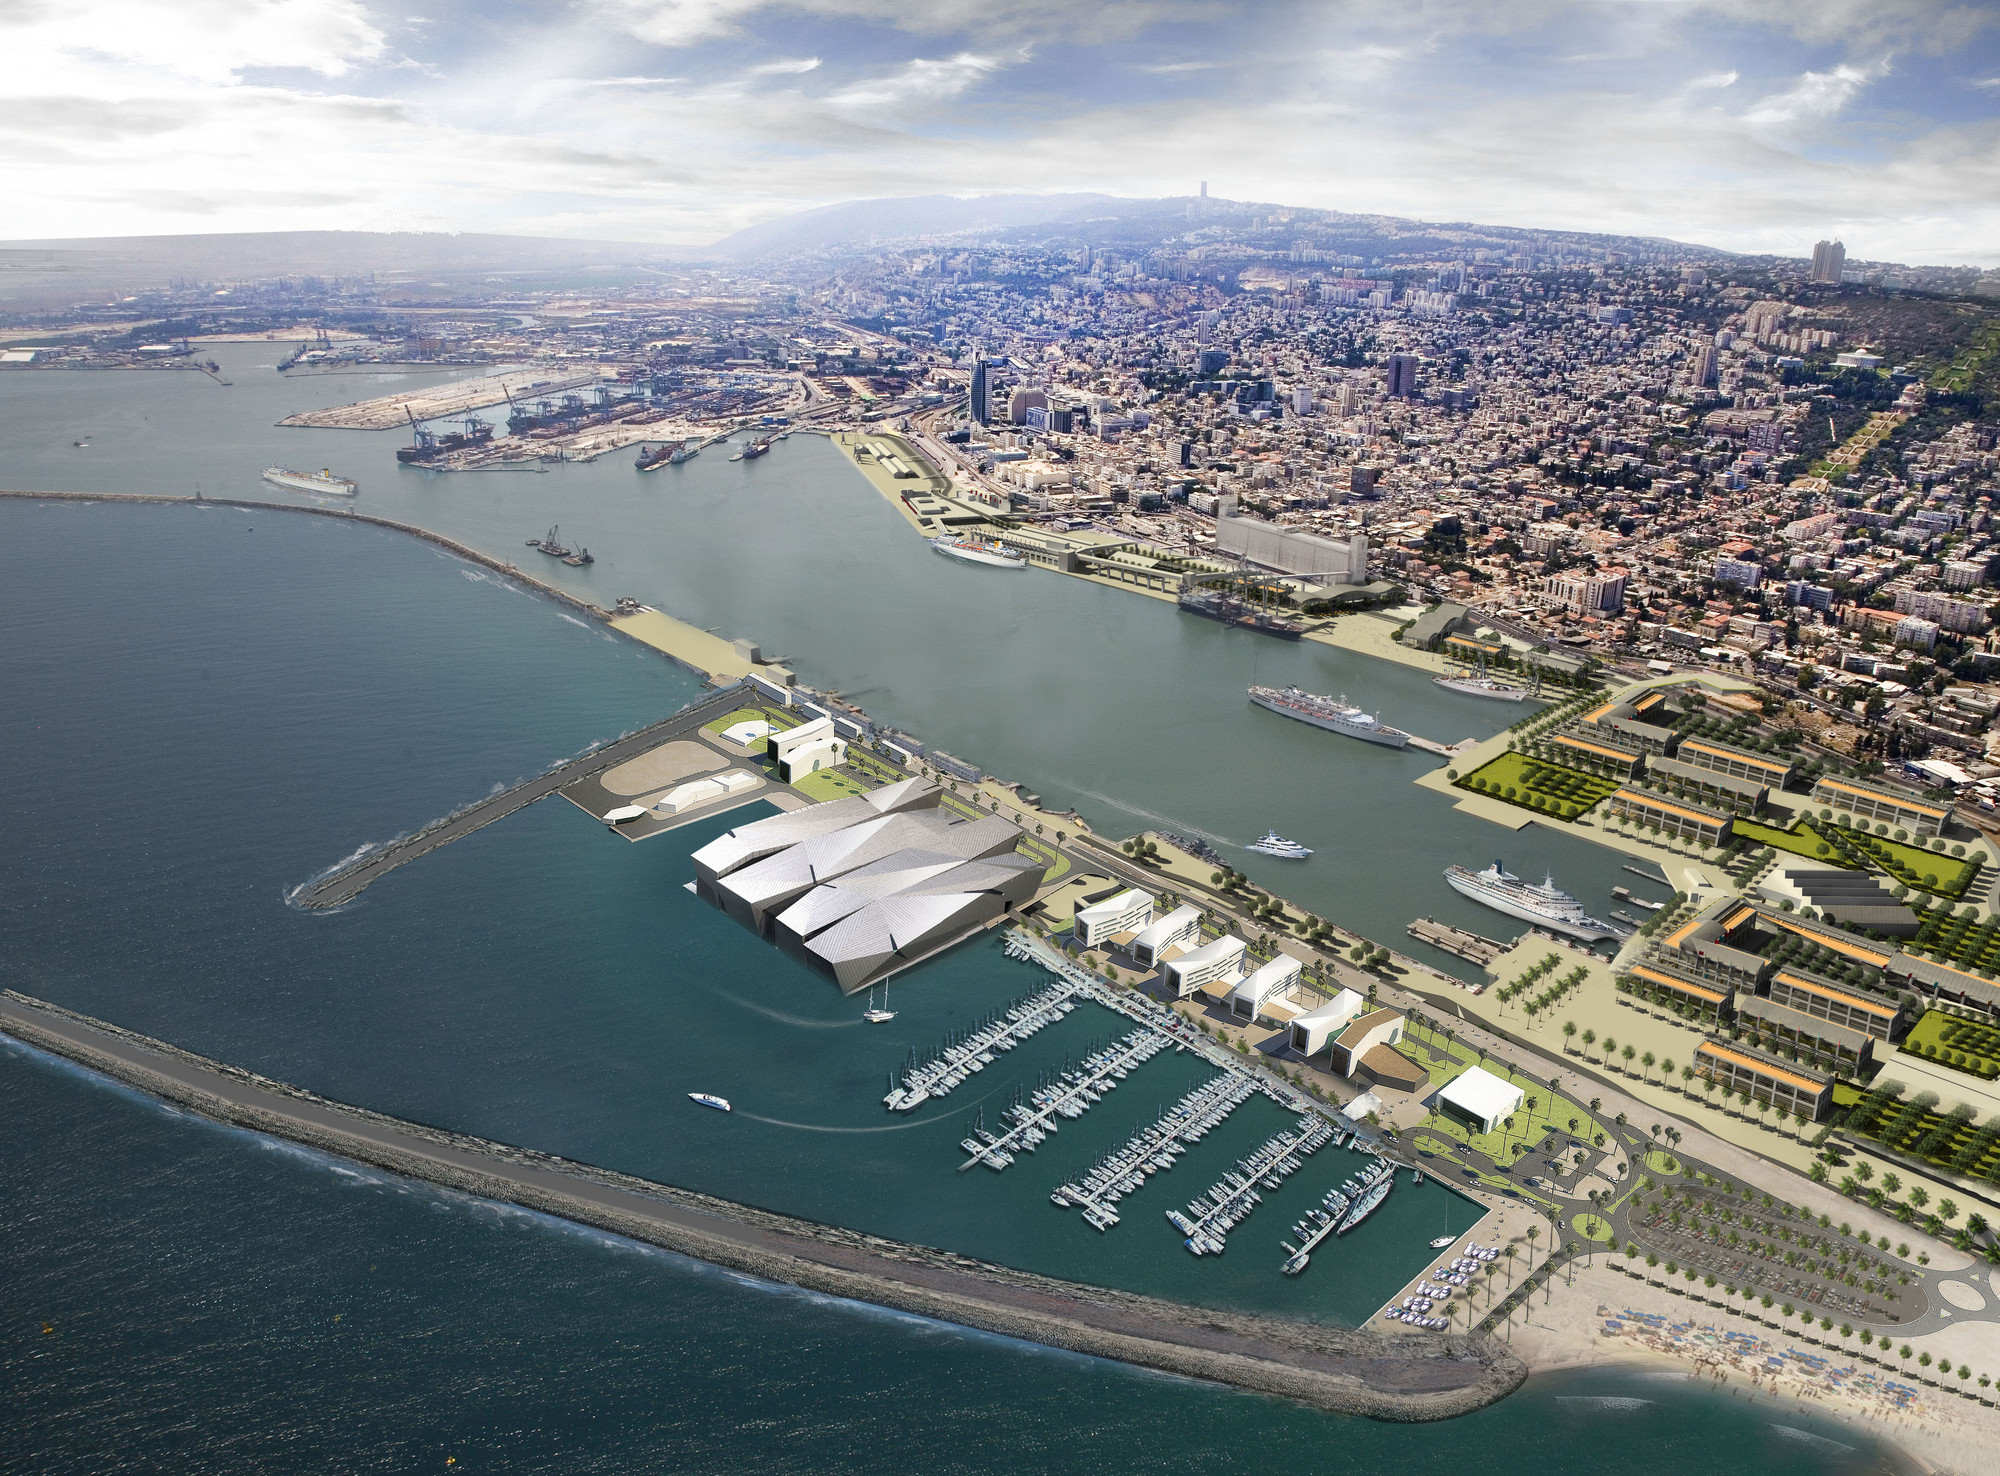 New Haifa Waterfront Plan / Amir Mann–Ami Shinar Architects and Planners, Courtesy of Amir Mann-Ami Shinar